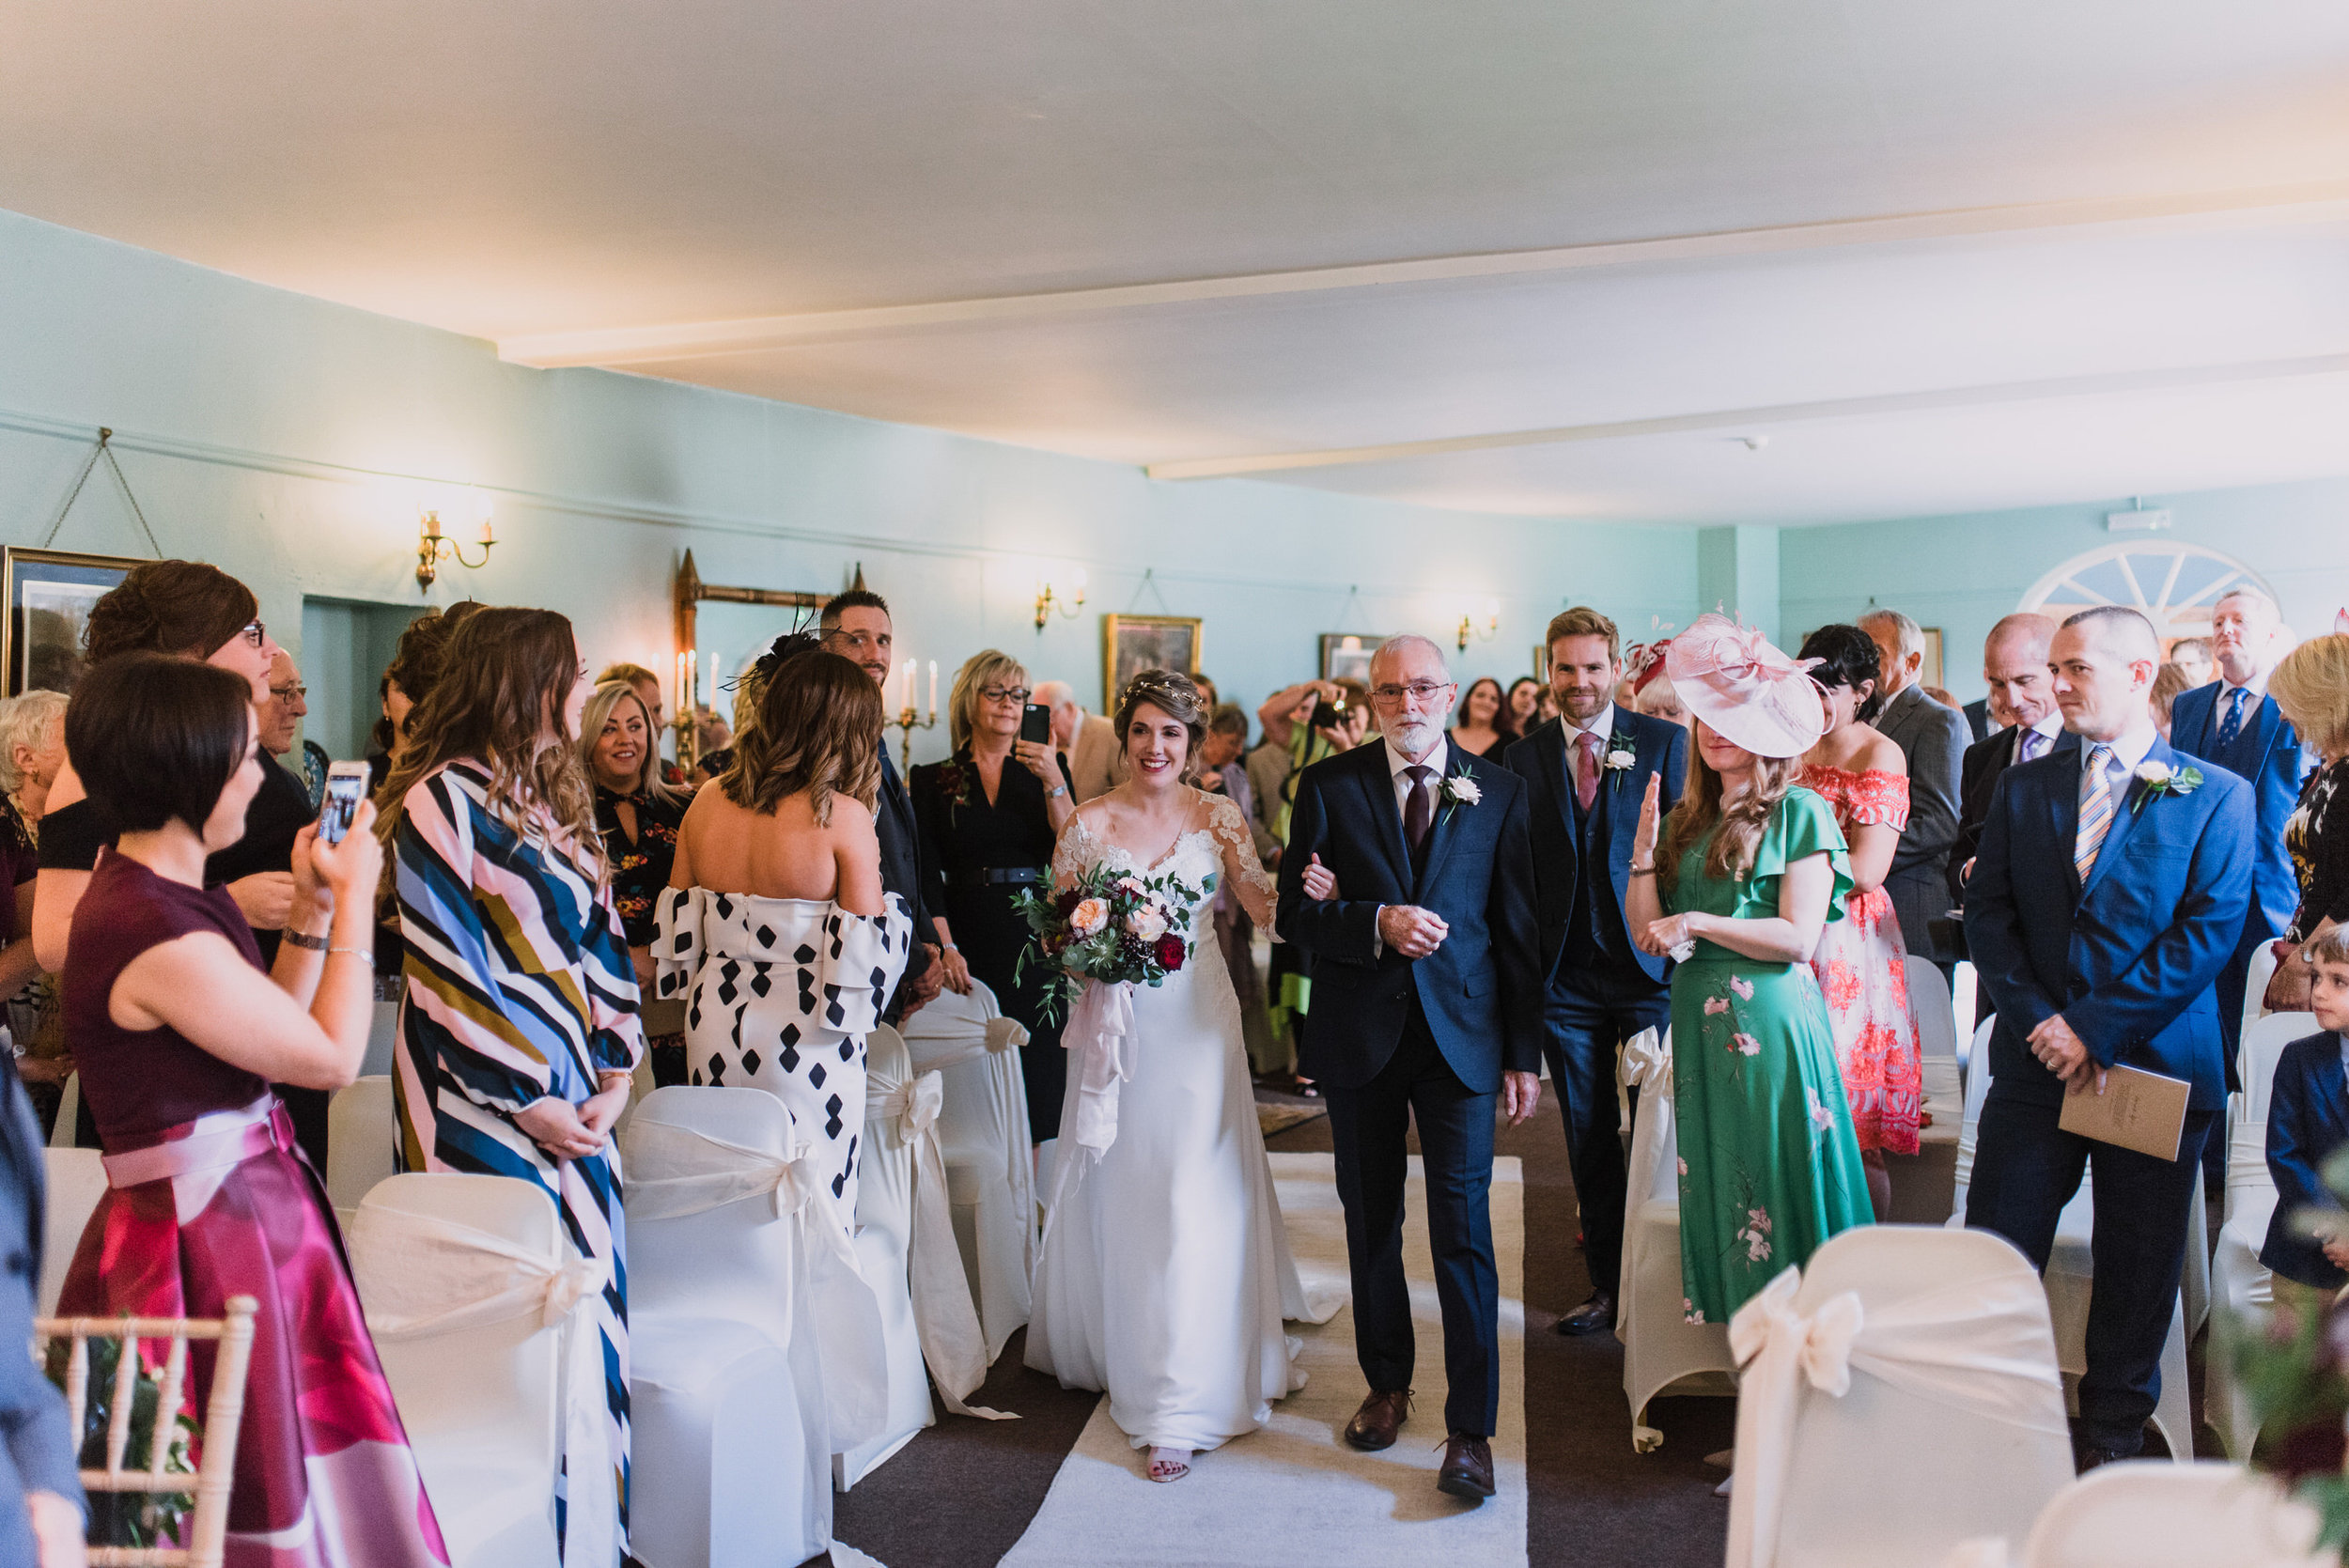 lissanoure castle wedding, northern ireland wedding photographer, romantic northern irish wedding venue, castle wedding ireland, natural wedding photography ni (47).jpg